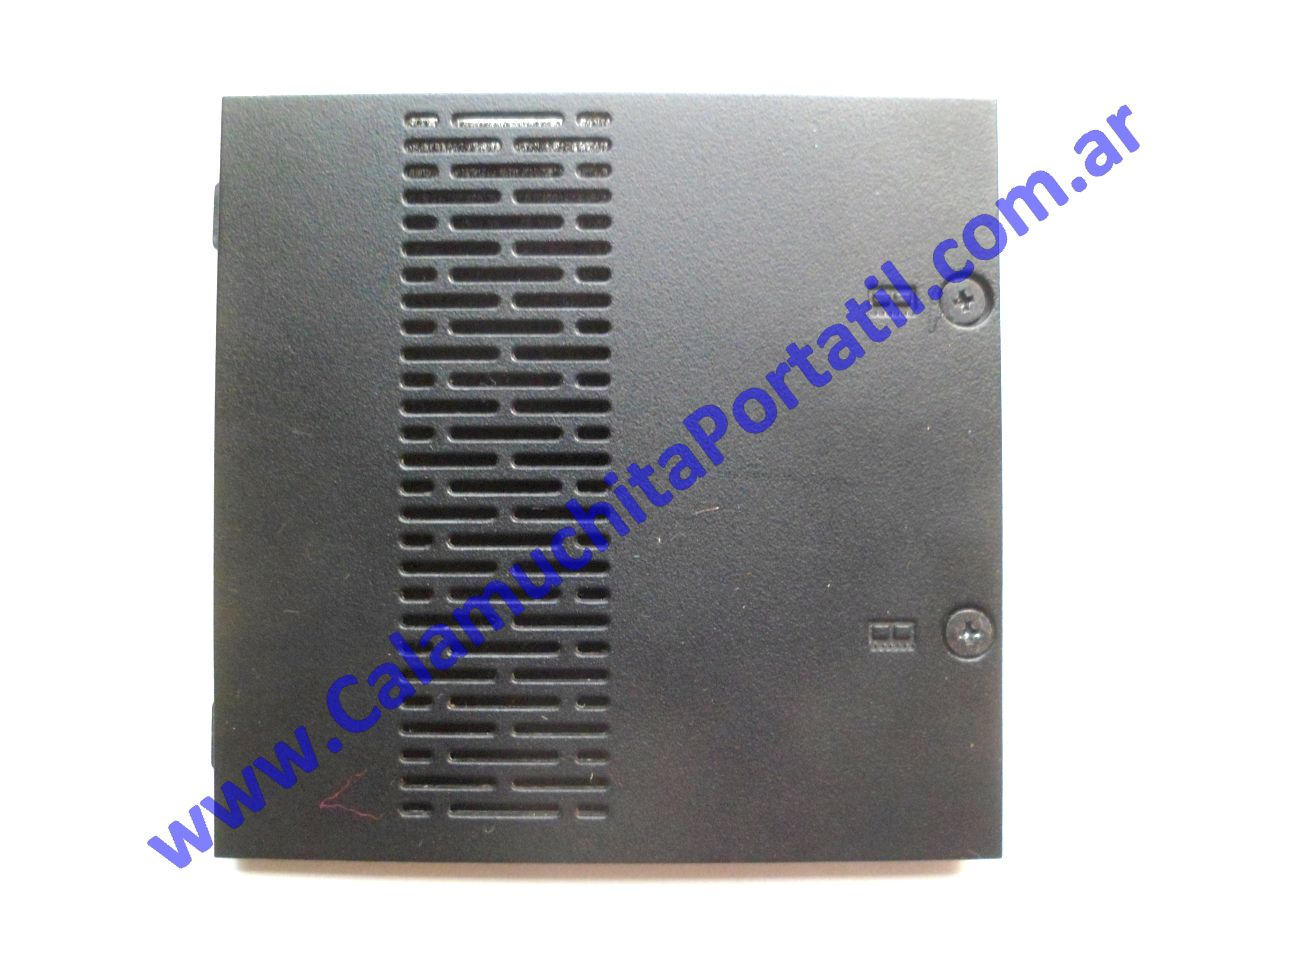 0553CTM Carcasas Tapa Memoria Hewlett Packard Pavillion dv2000 / dv2422la / GM690LA#AC8